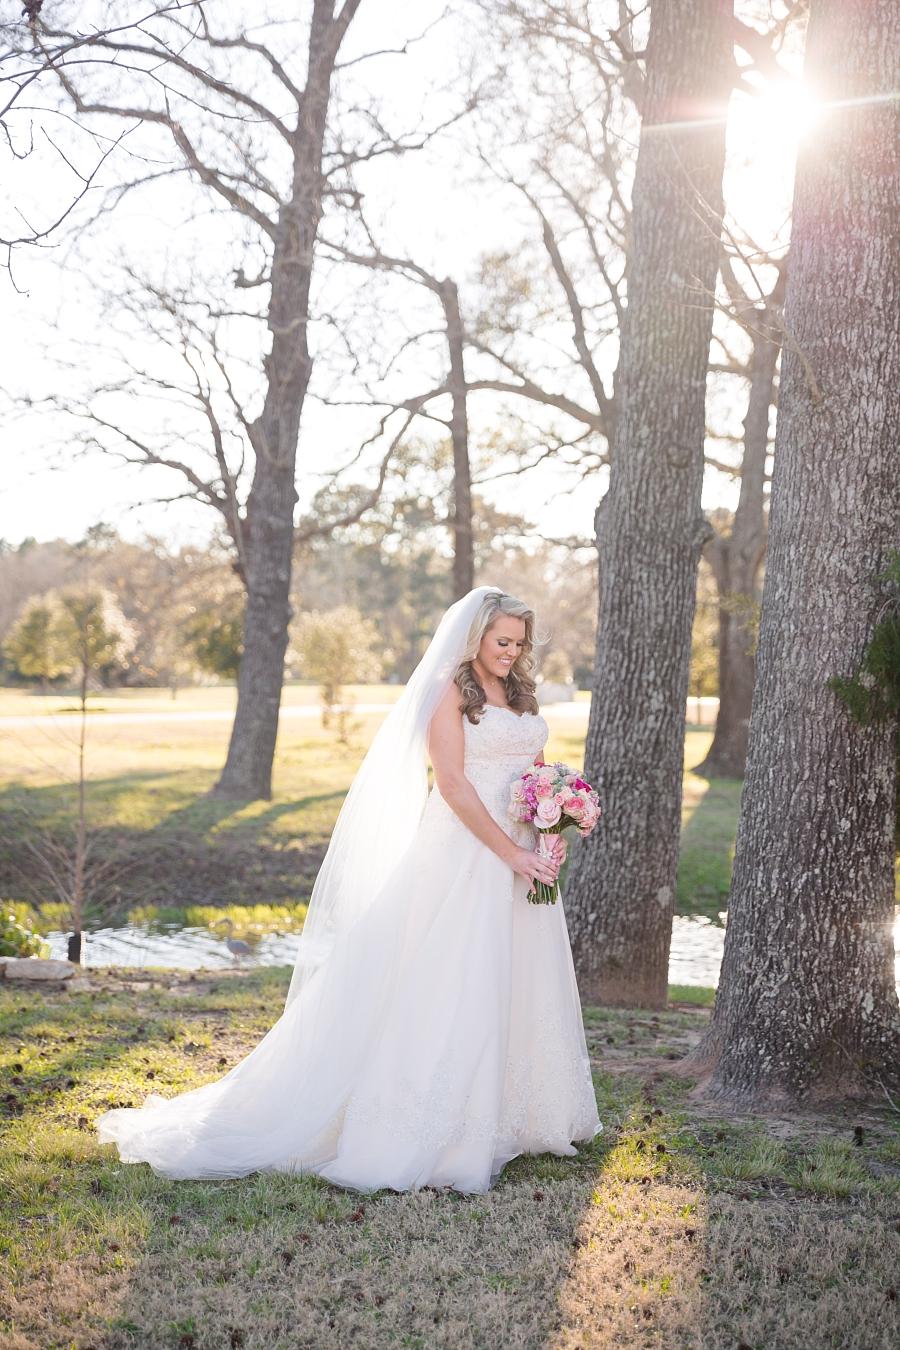 Stacy-Anderson-Photography-Balmorhea-Tomball-Wedding-Photographer_0009.jpg